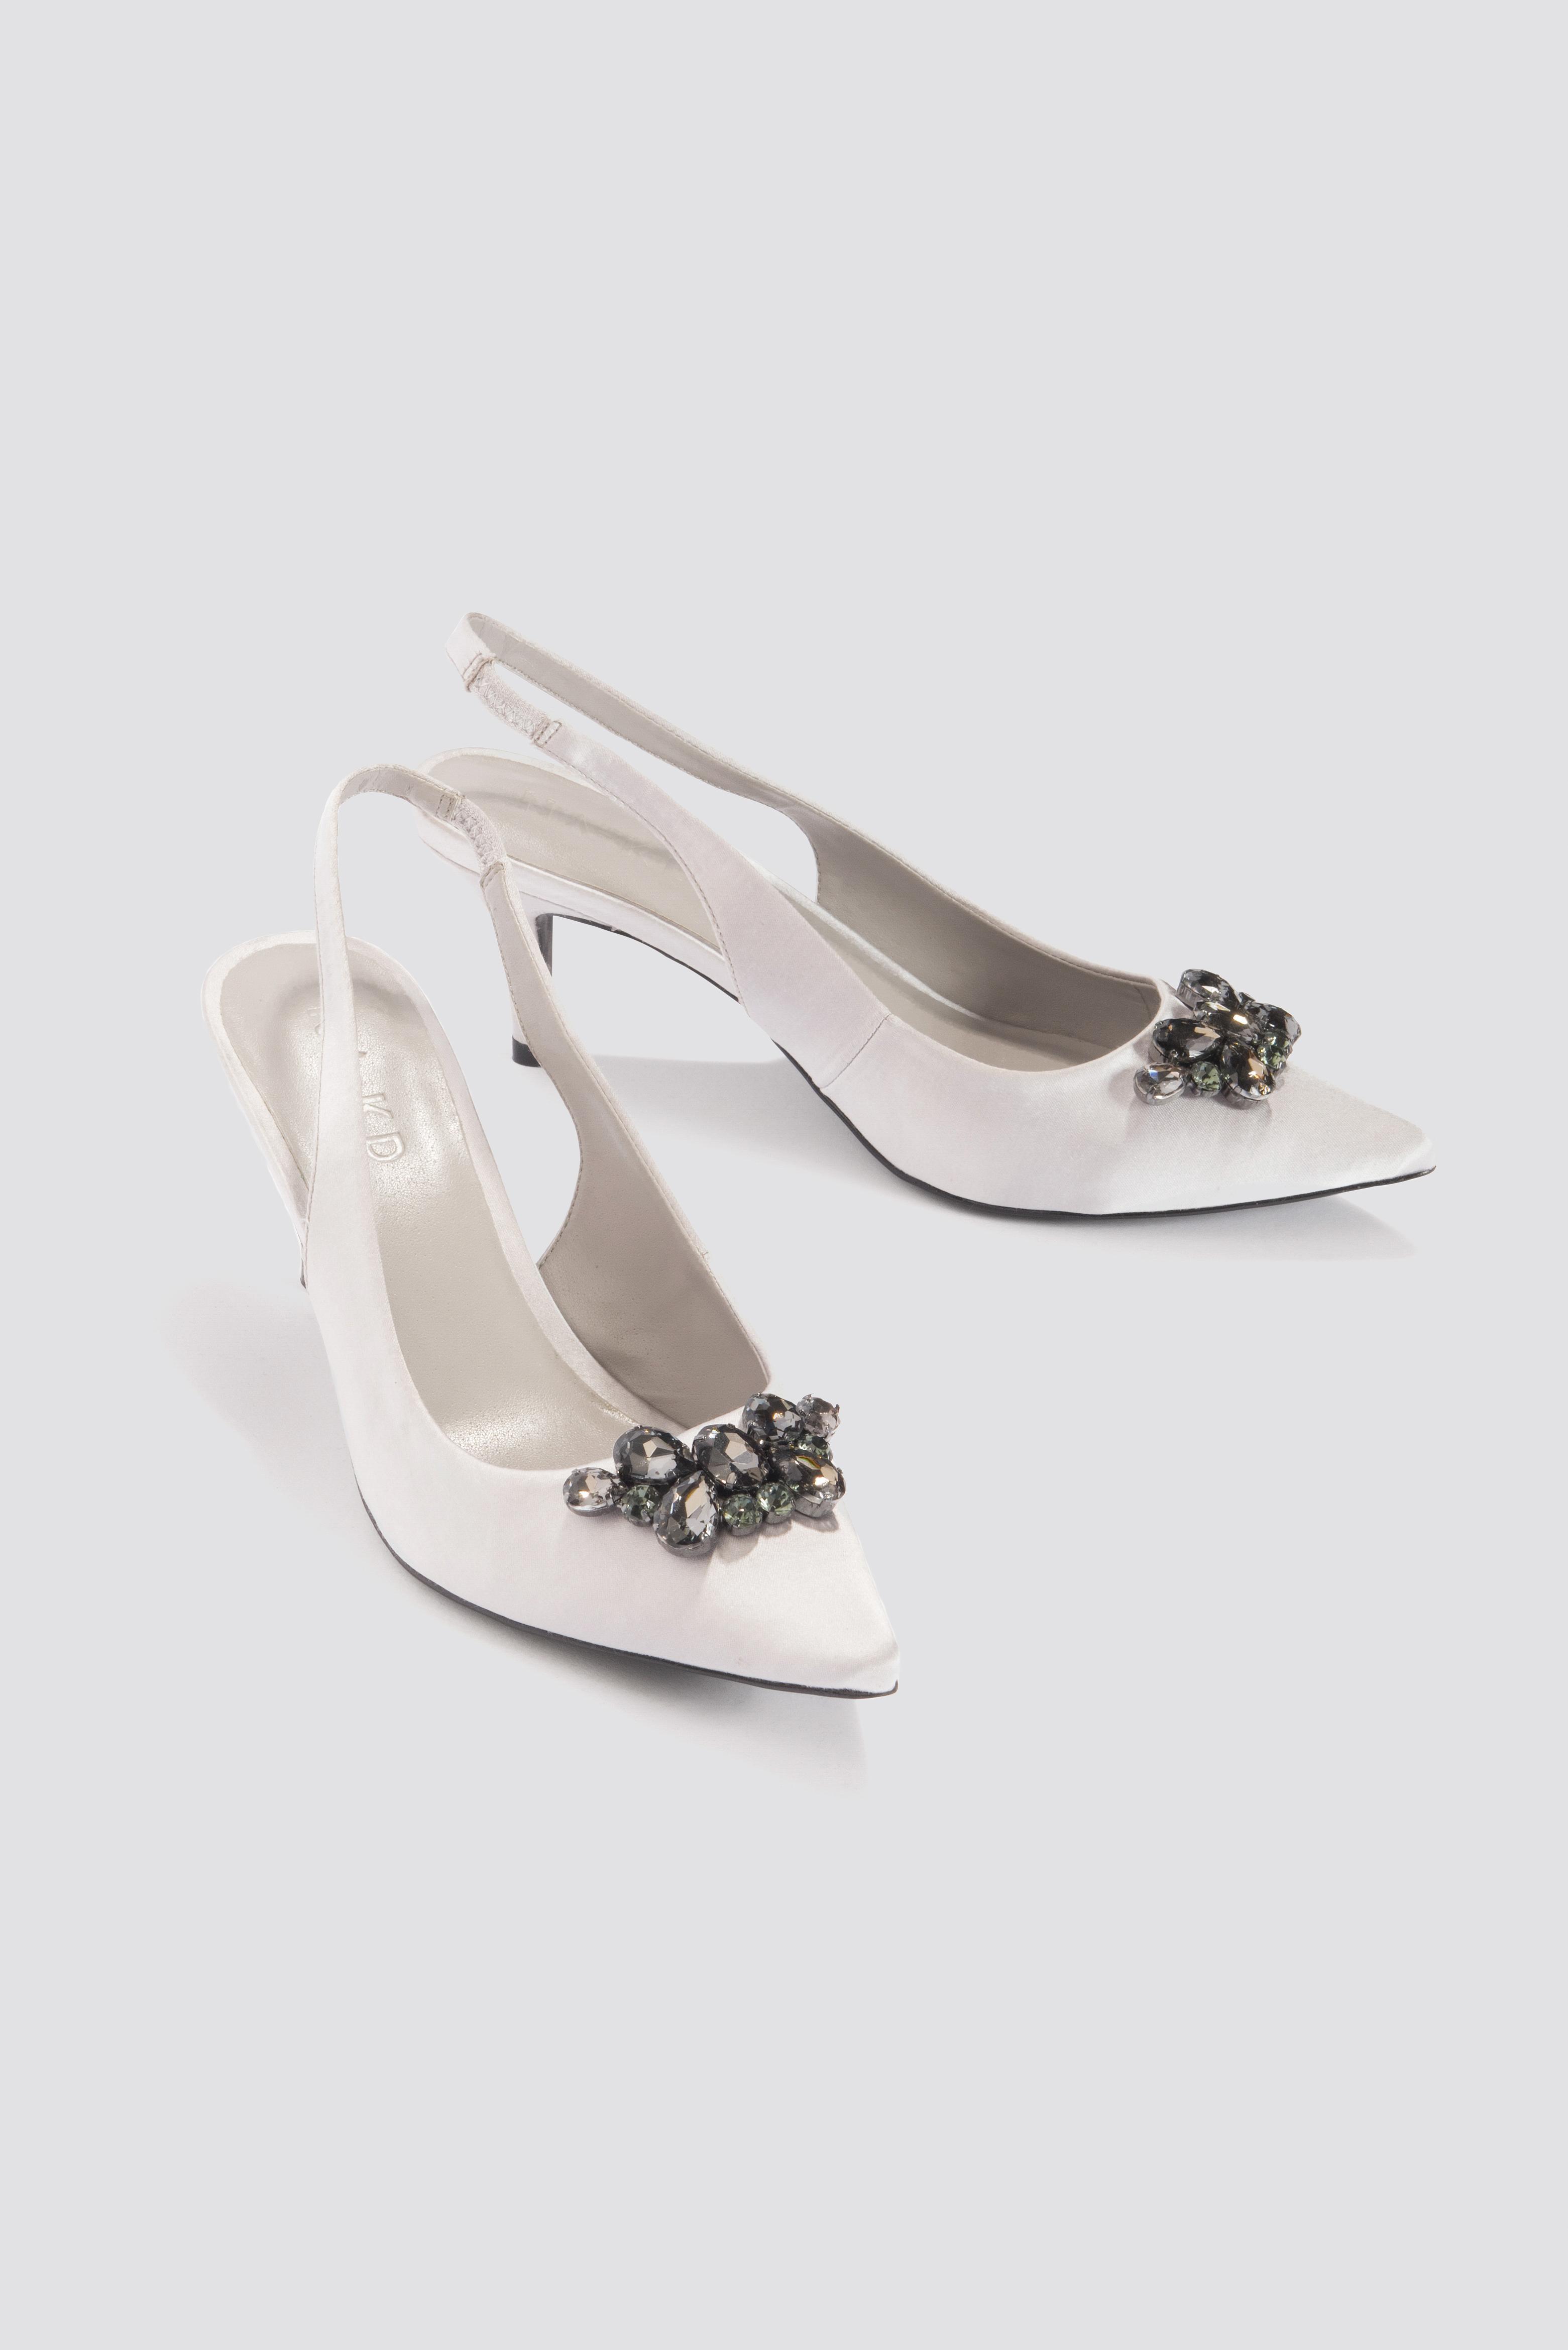 374cfea69d Na-Kd Dark Embellished Kitten Heel Pumps - White, Silver | ModeSens